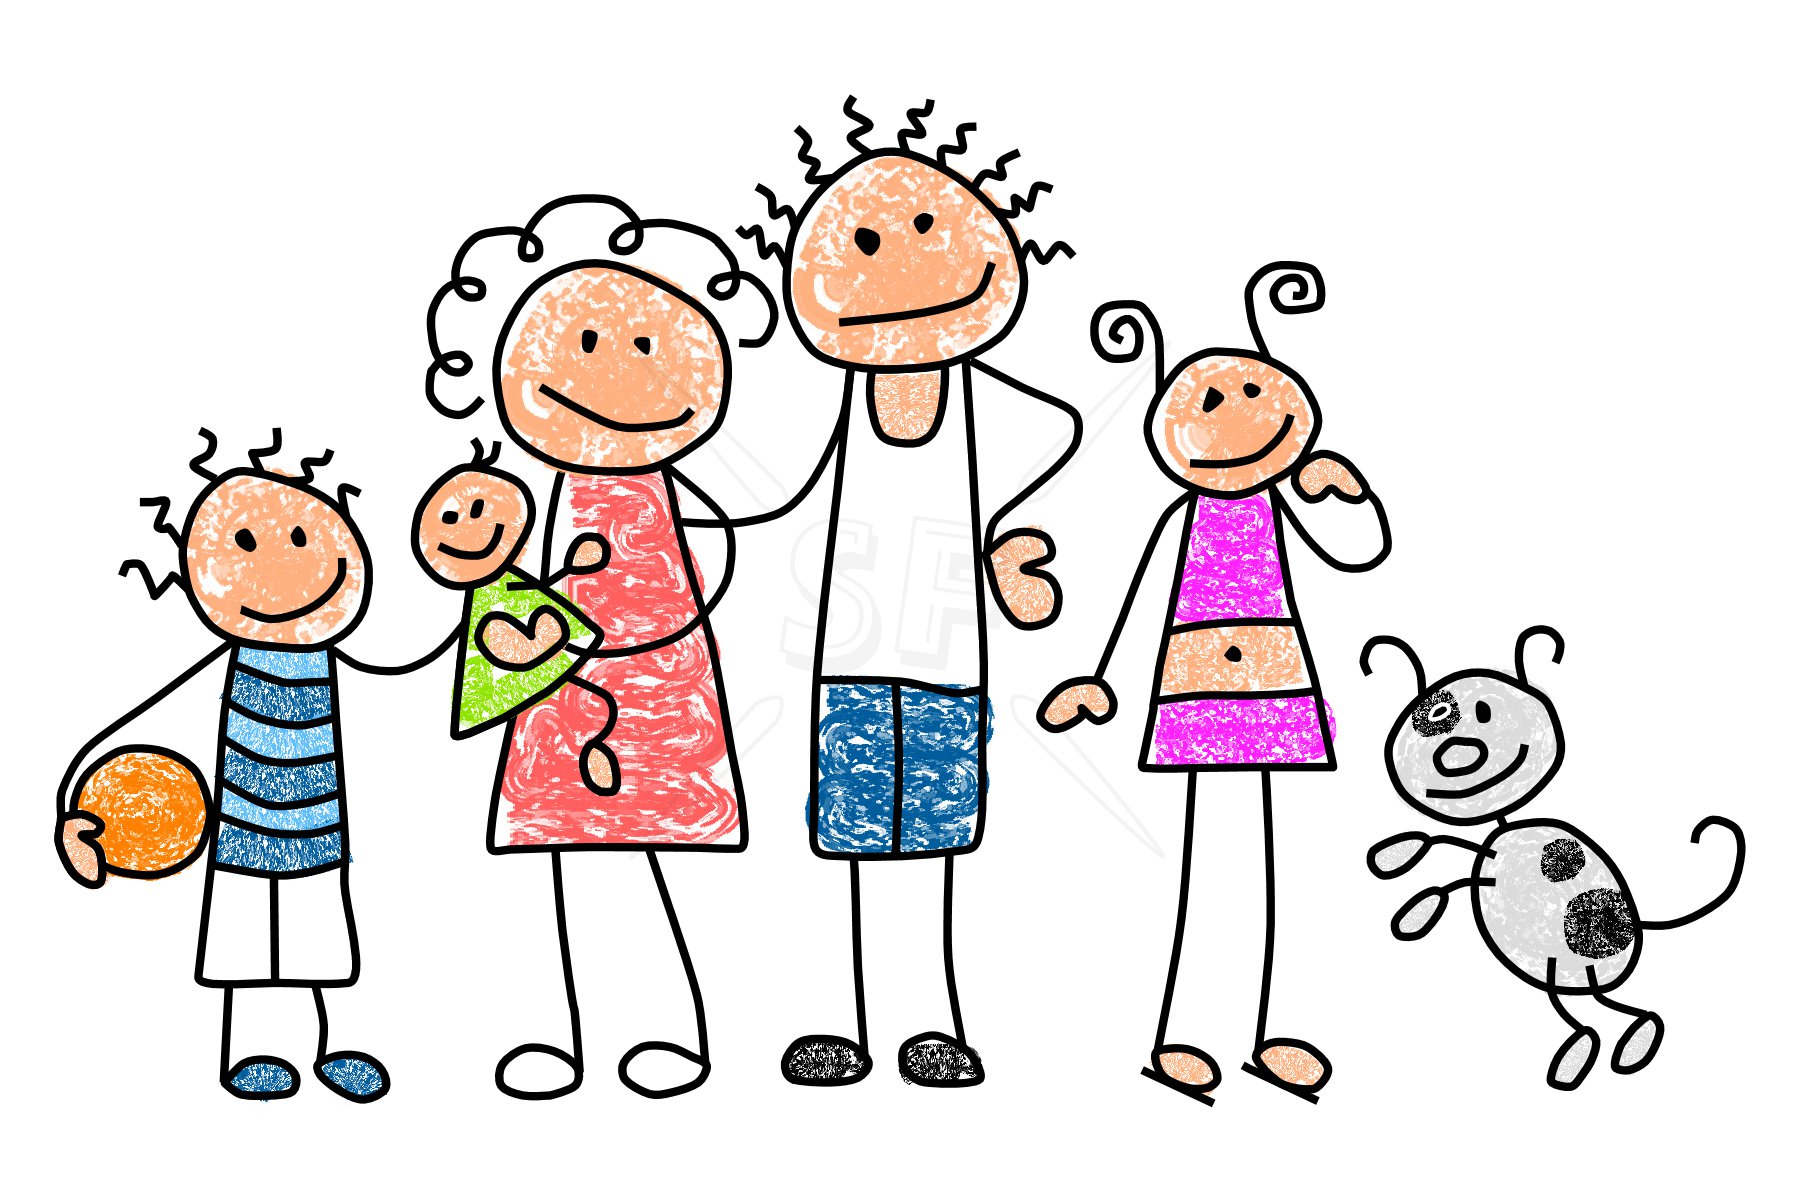 Stick Figure Family Clip Art N2 free image.